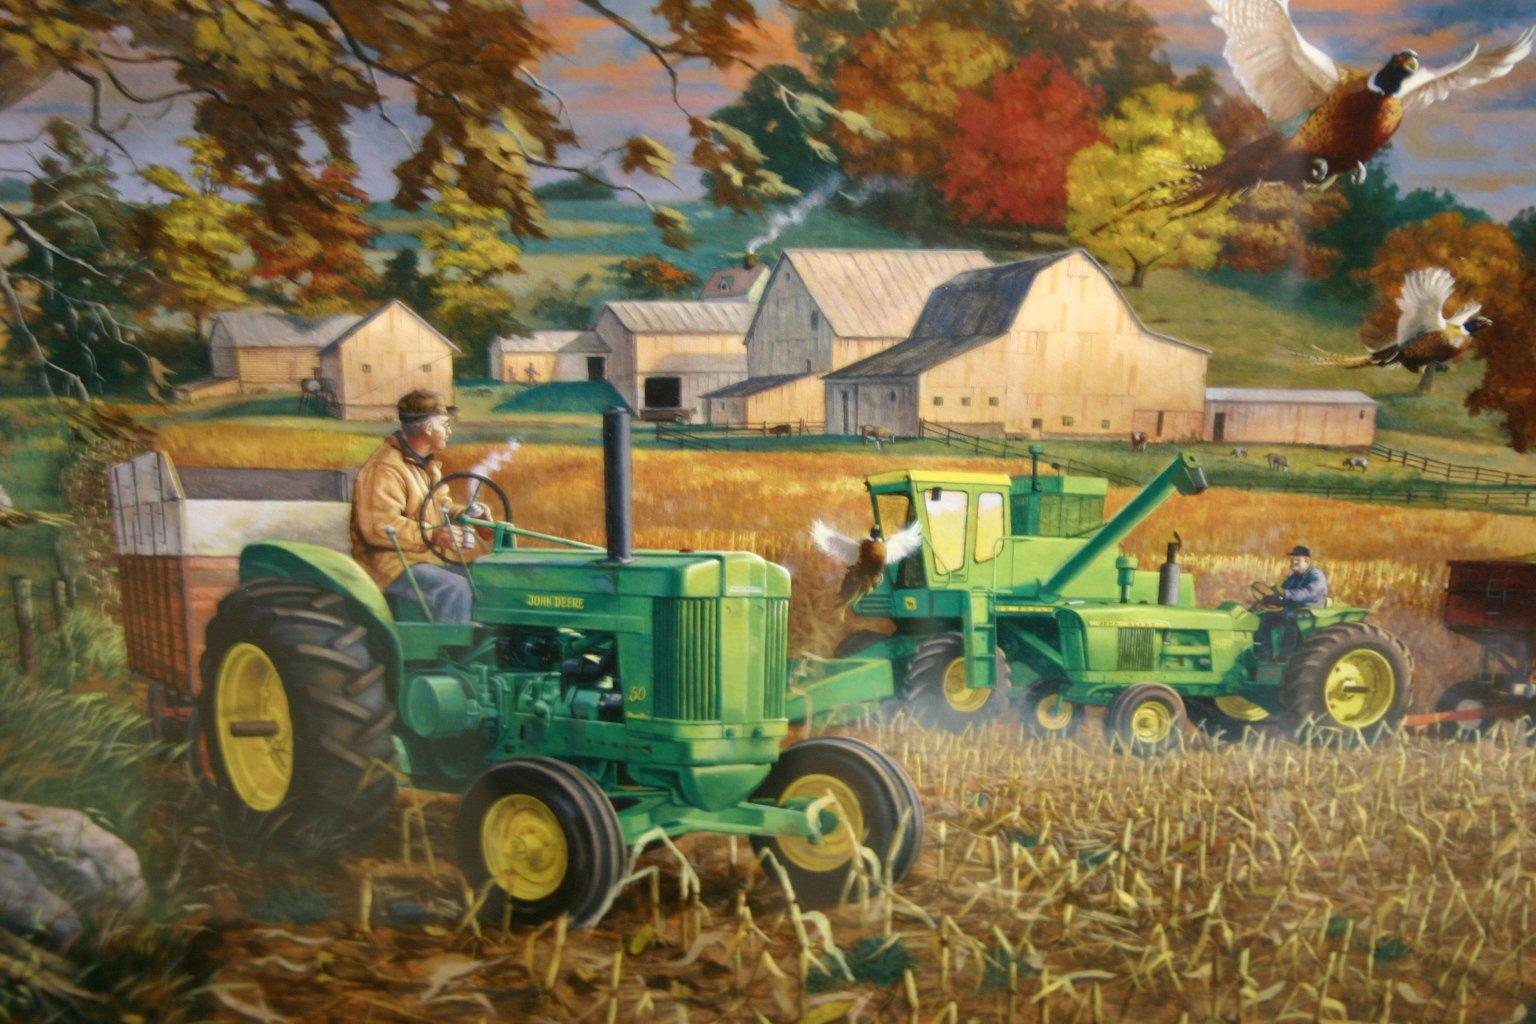 Farm Scene Models httpwwwgreencrazycomshowprodaspprodidSWA11 1536x1024